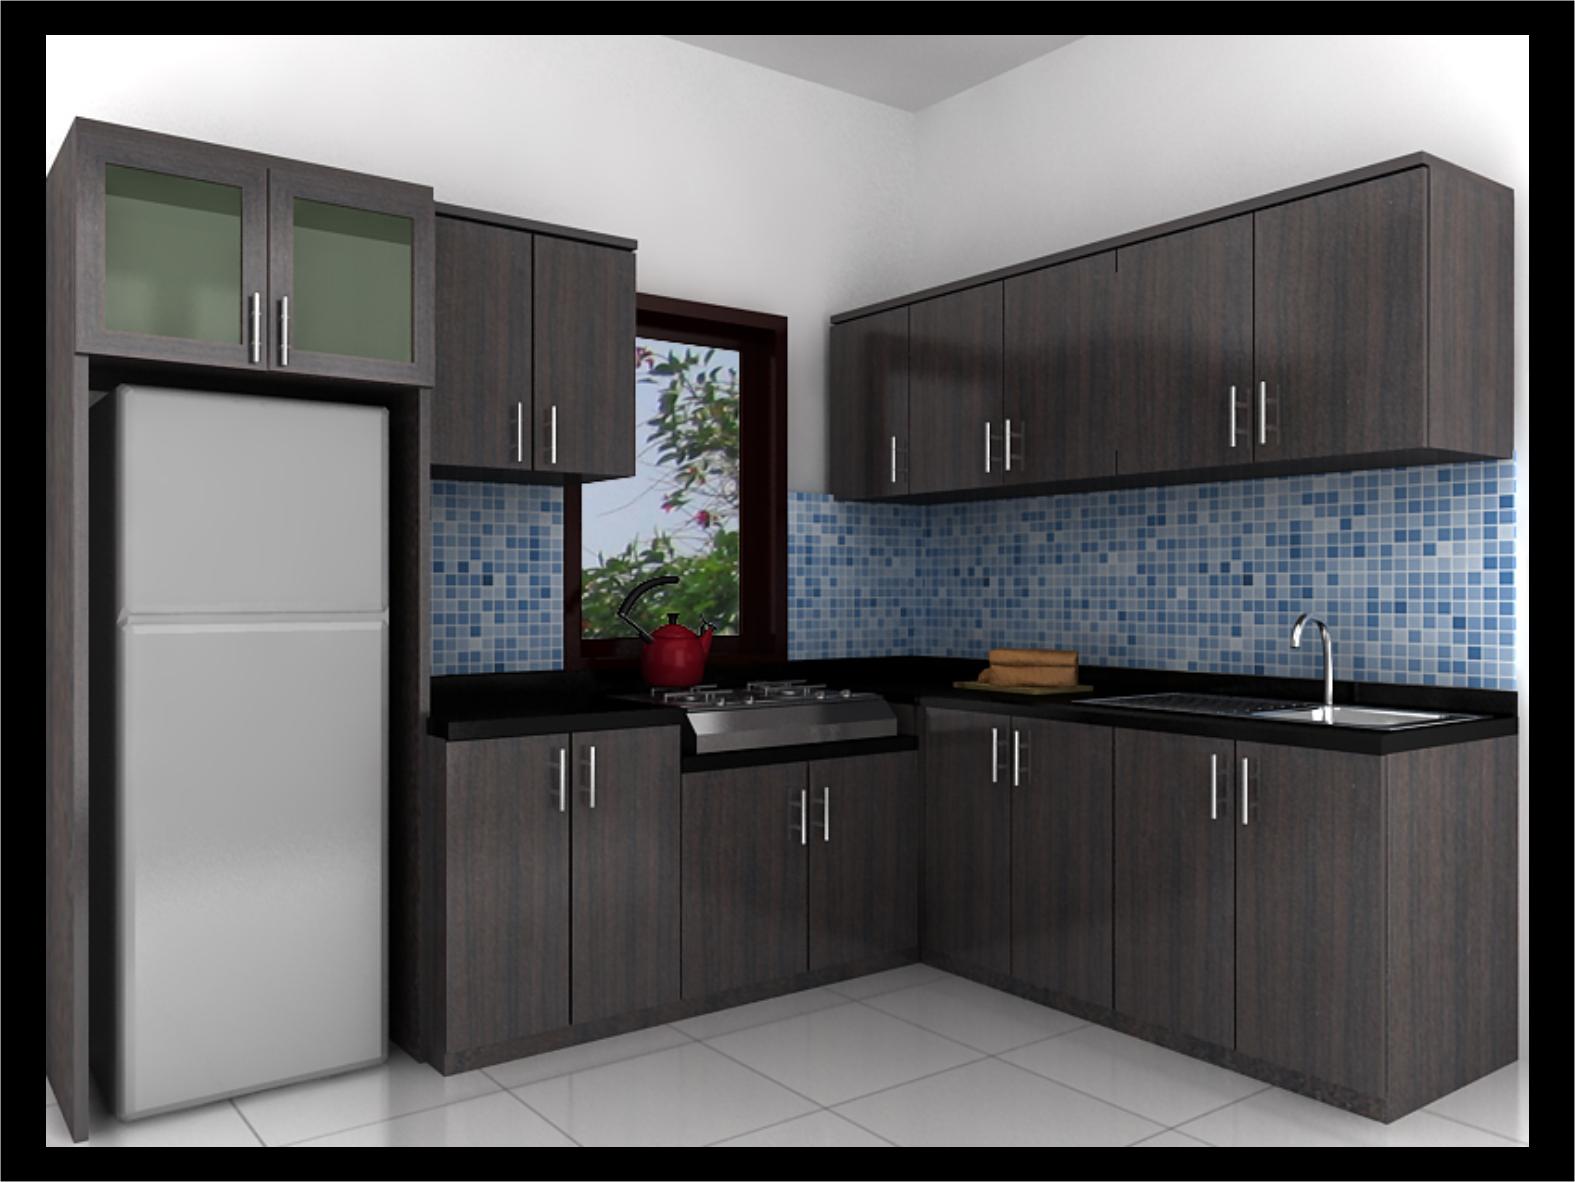 contoh dapur sederhana minimalis paling cantiikkkkk